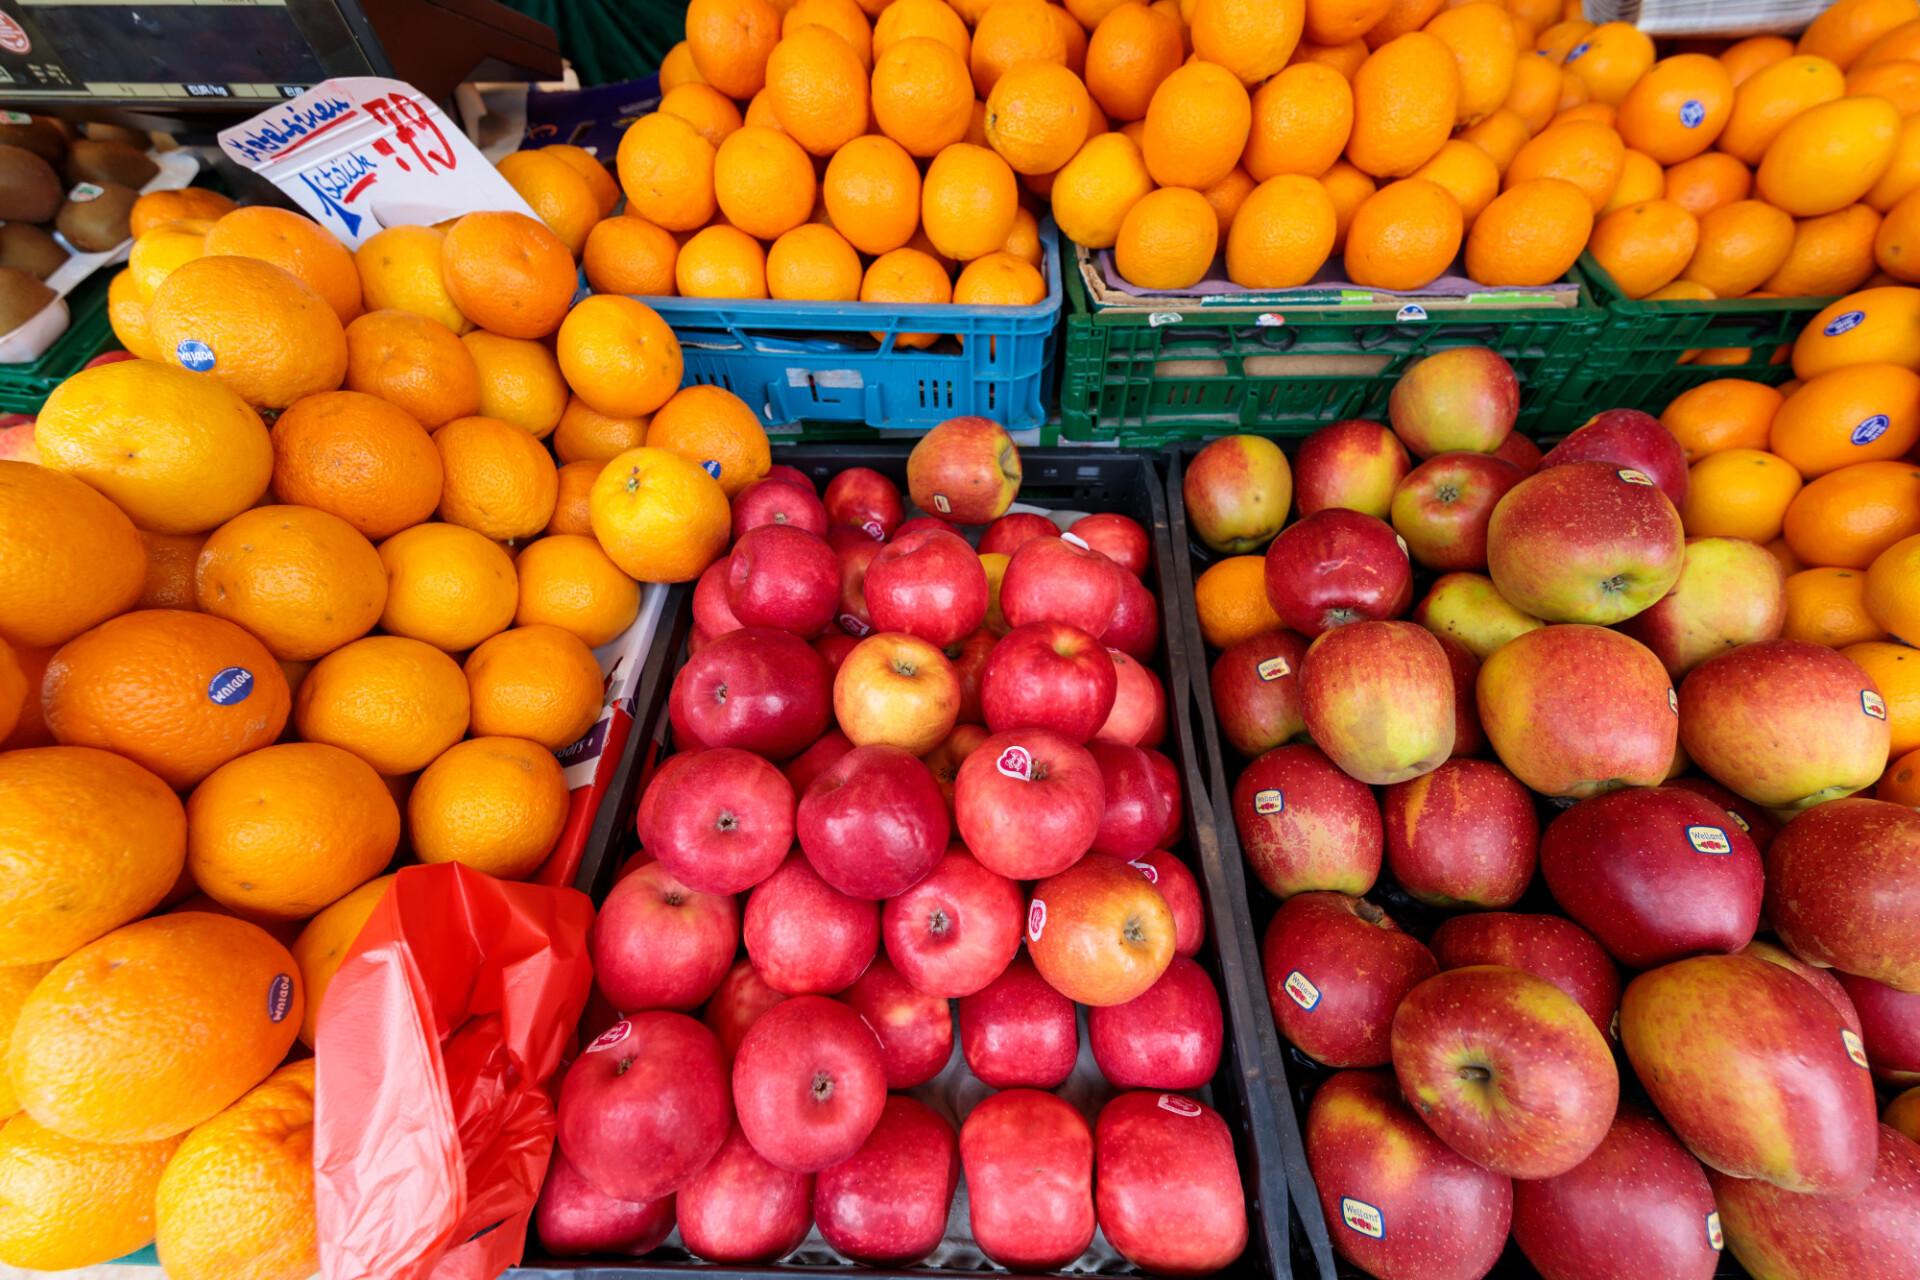 Fruit seller at the market